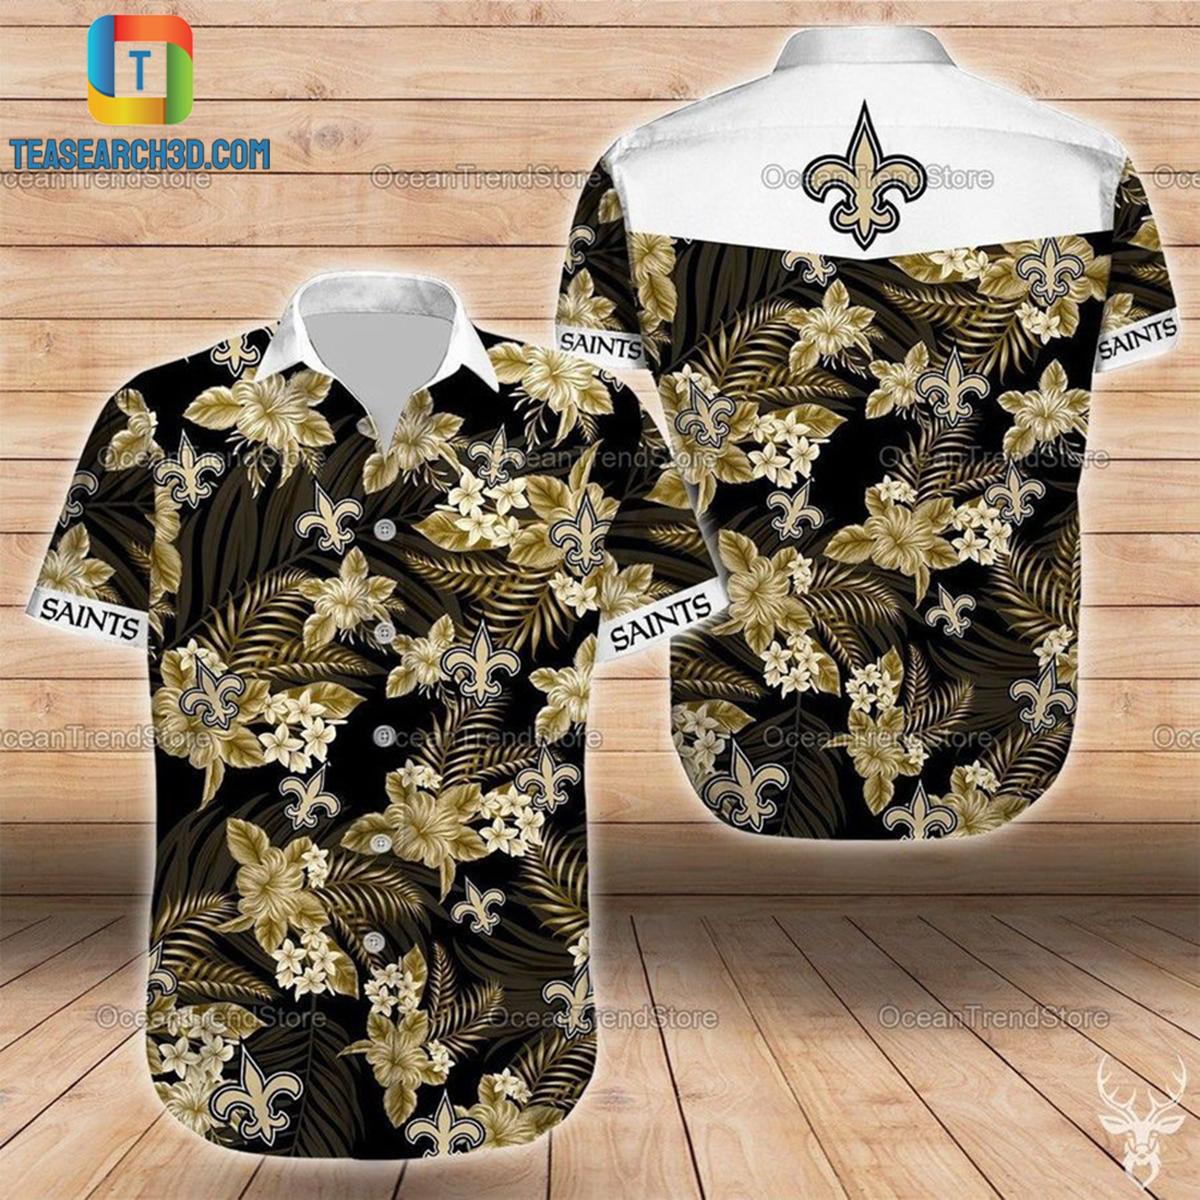 New orleans saints nfl football hawaiian shirt 2